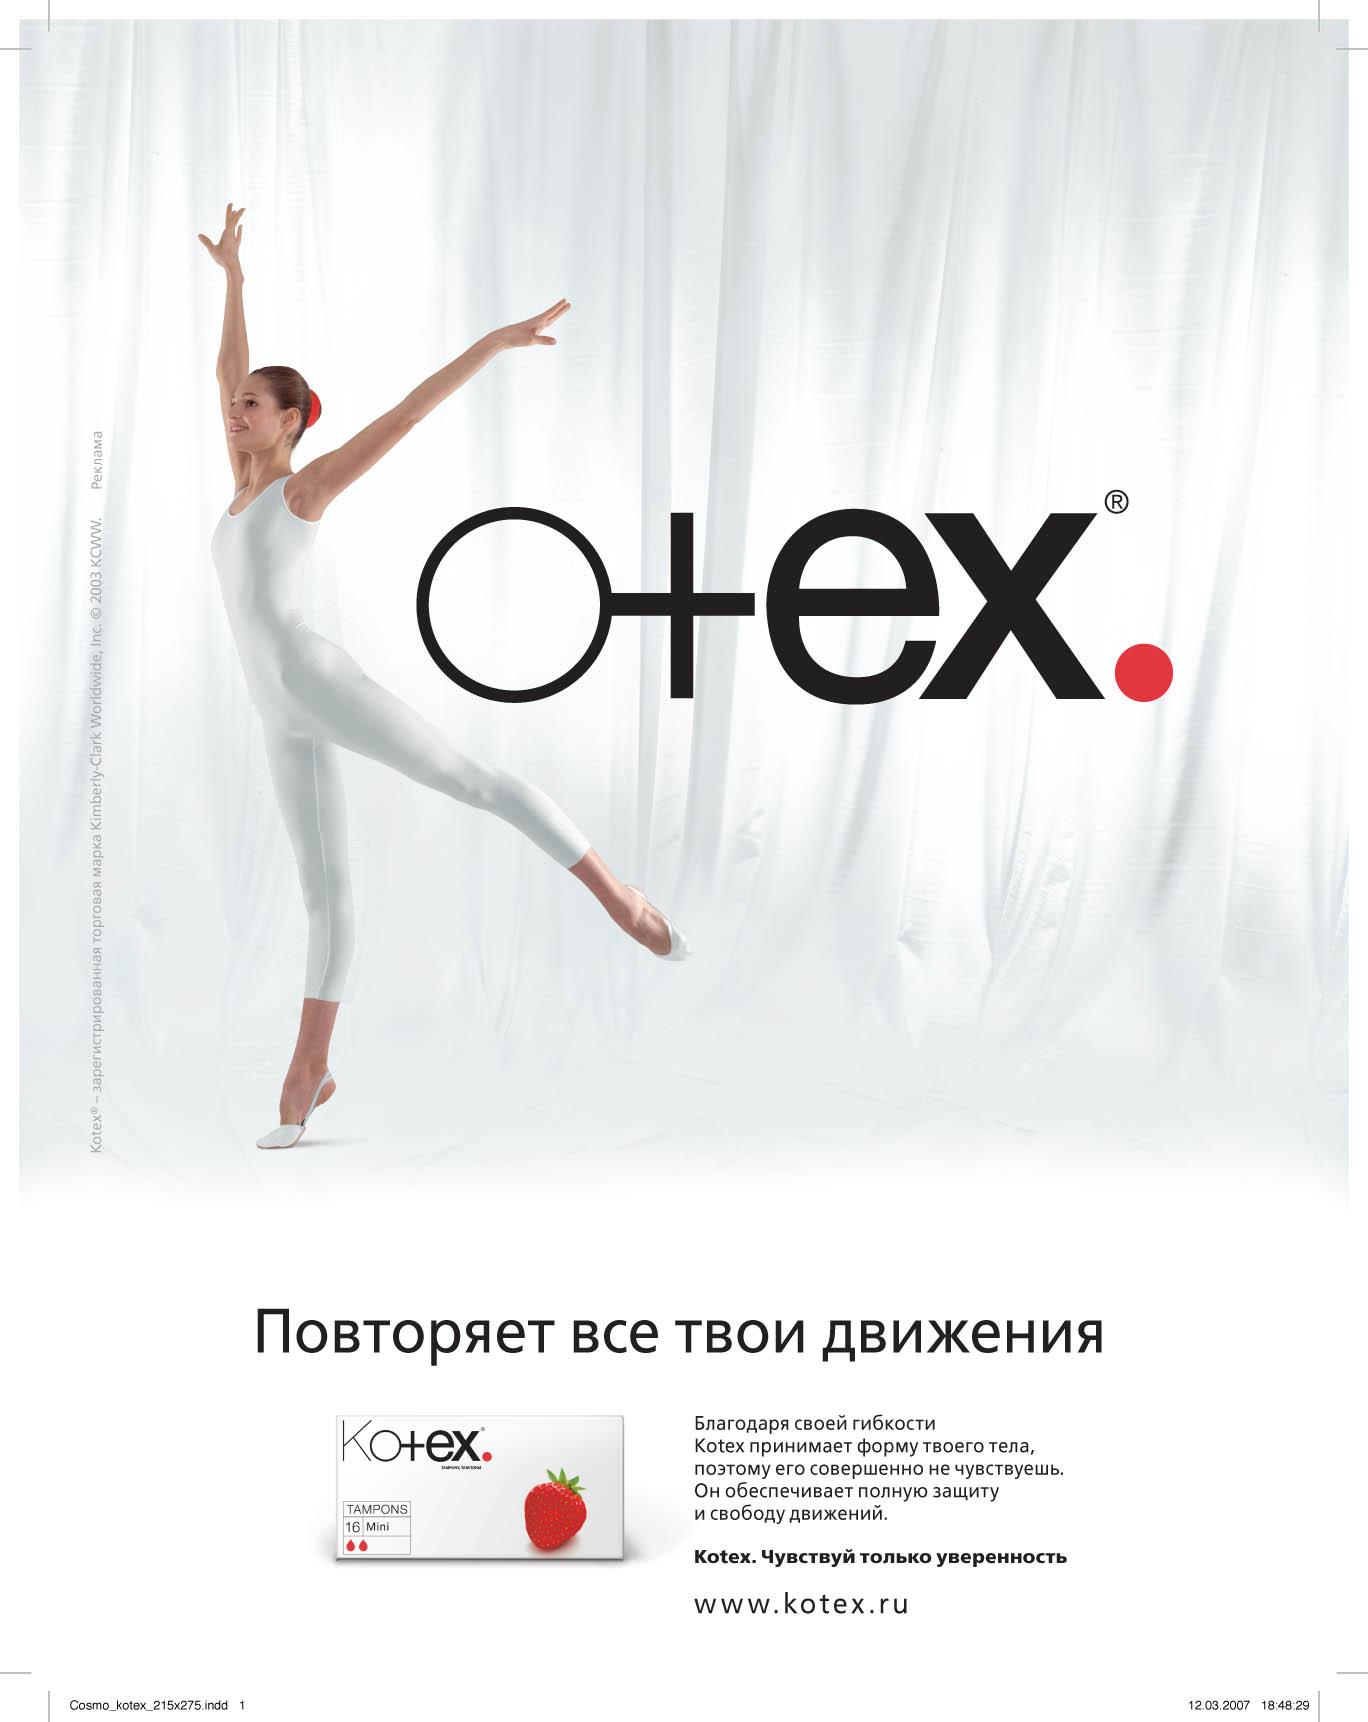 Шишонин гимнастика для шеи 25 фотография